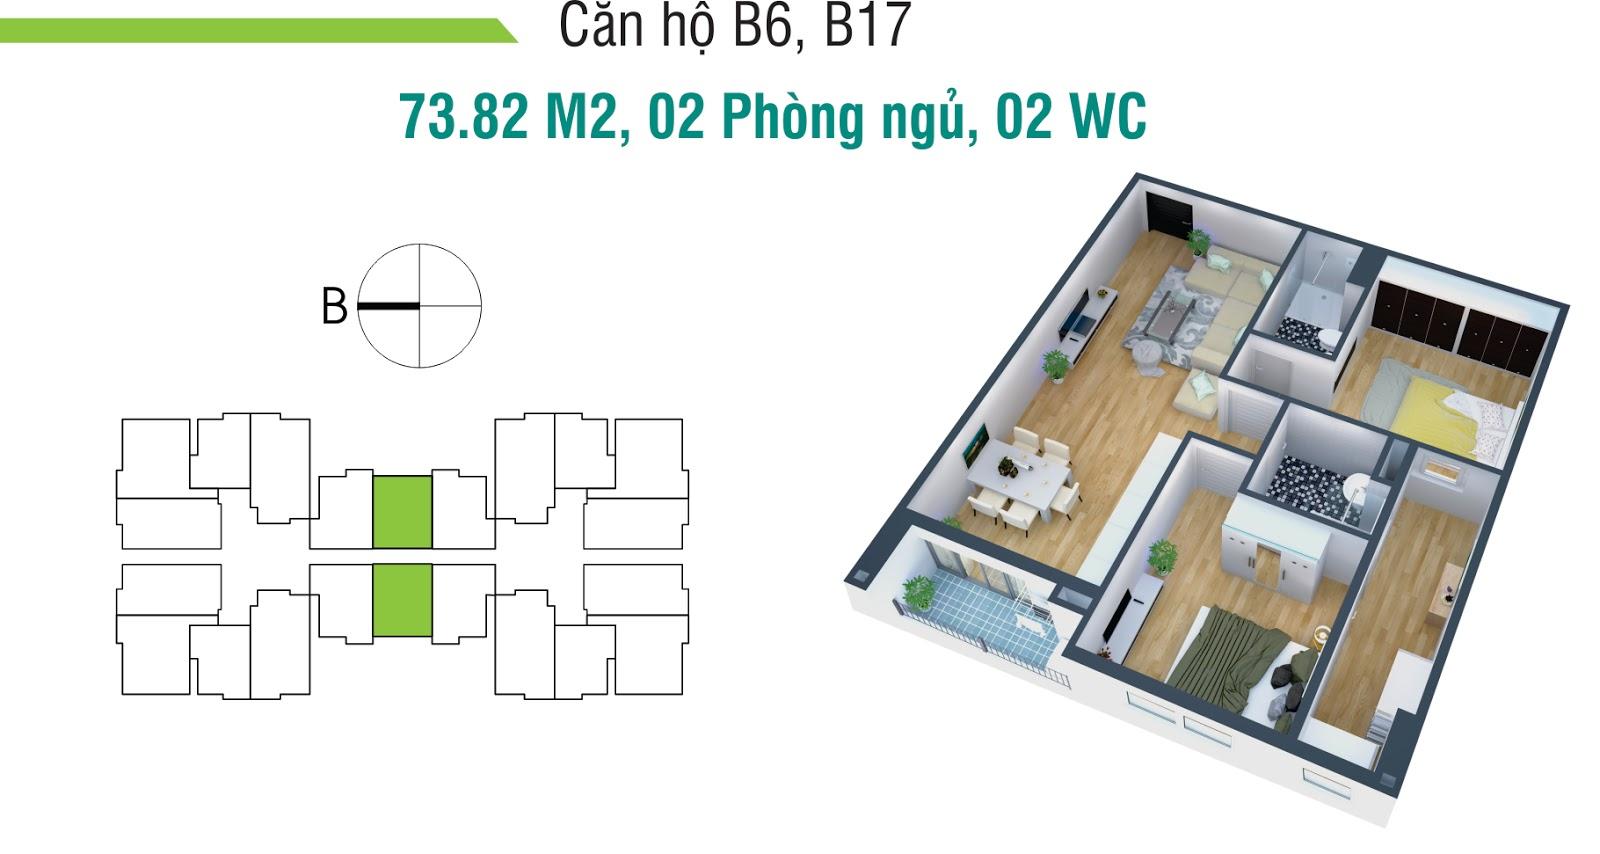 mat-bang-can-ho-b5-sky-central-176-dinh-cong